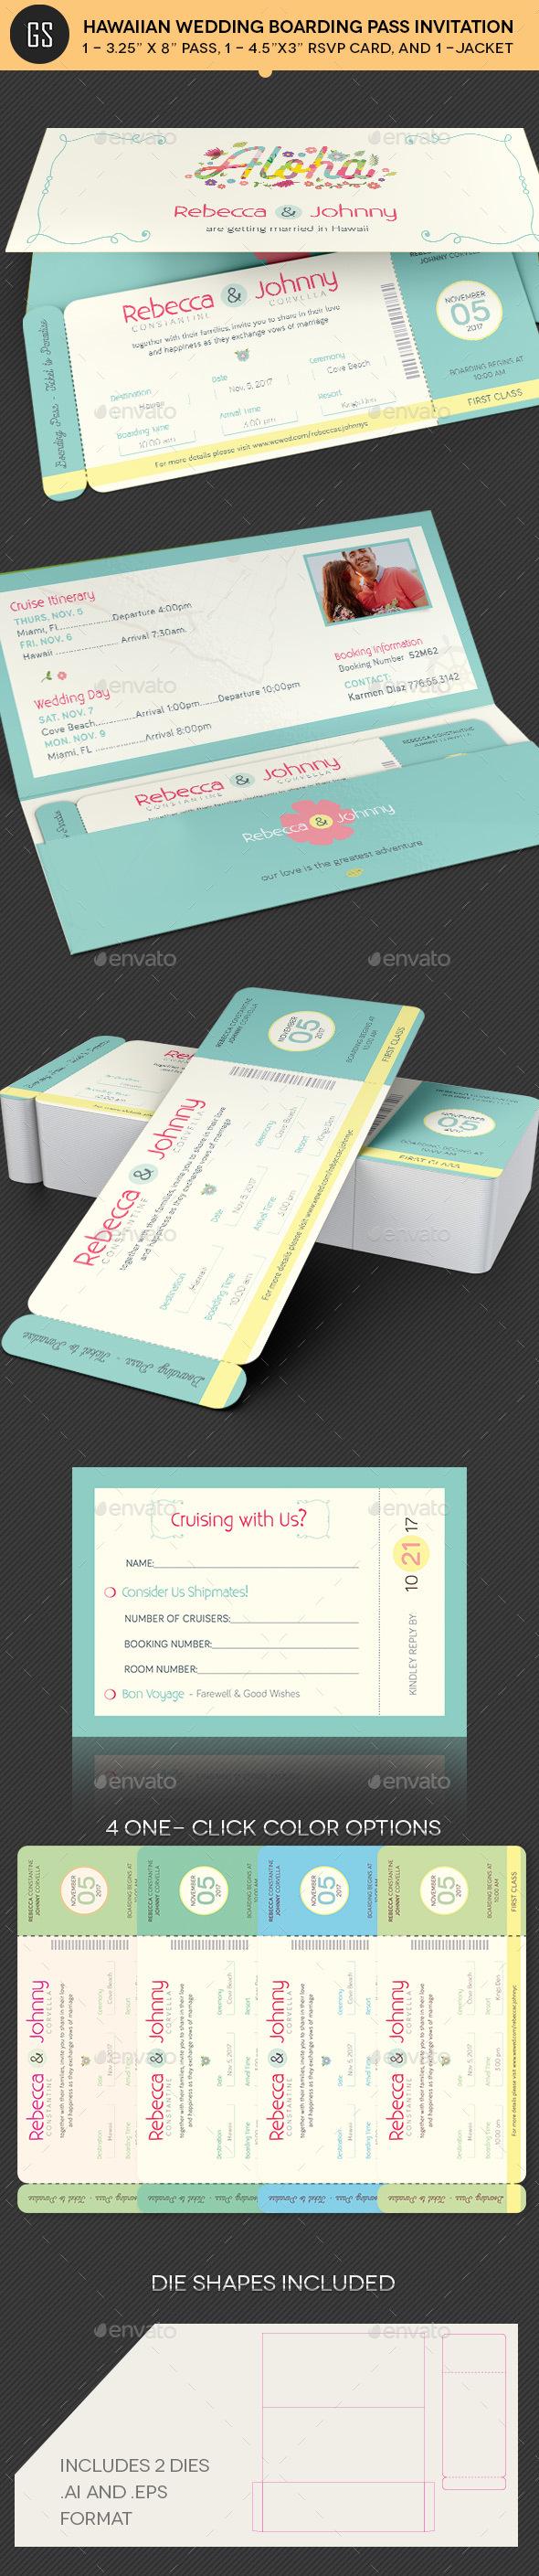 Hawaiian Wedding Boarding Pass Invitation Template - Invitations Cards & Invites